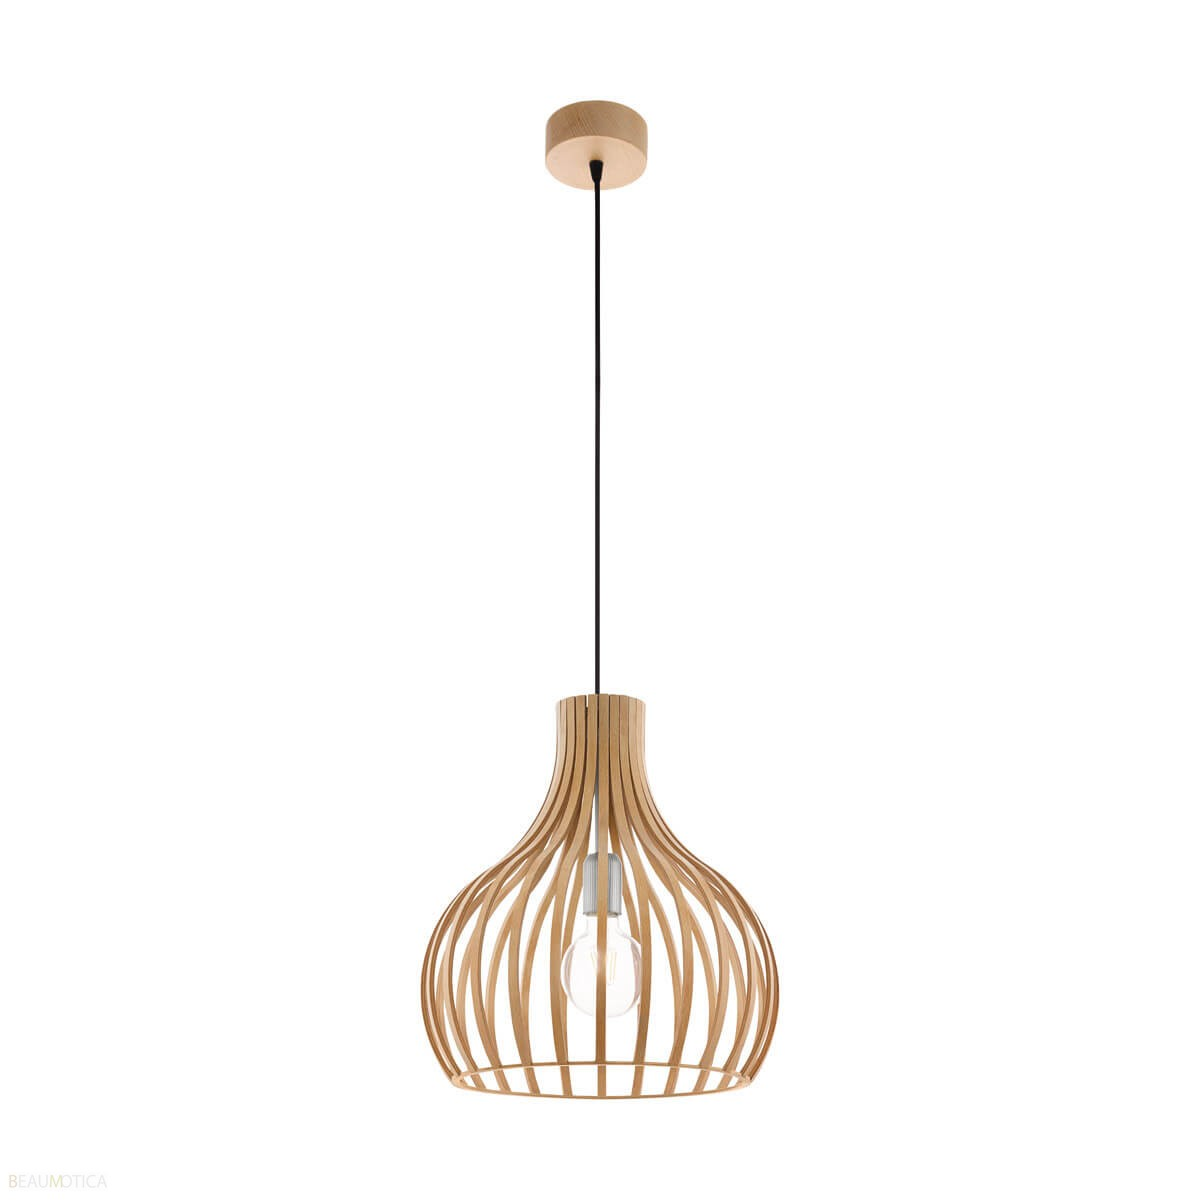 Afbeelding van Eglo Carnico Hanglamp (Natuur Mat Chroom) ø38cm